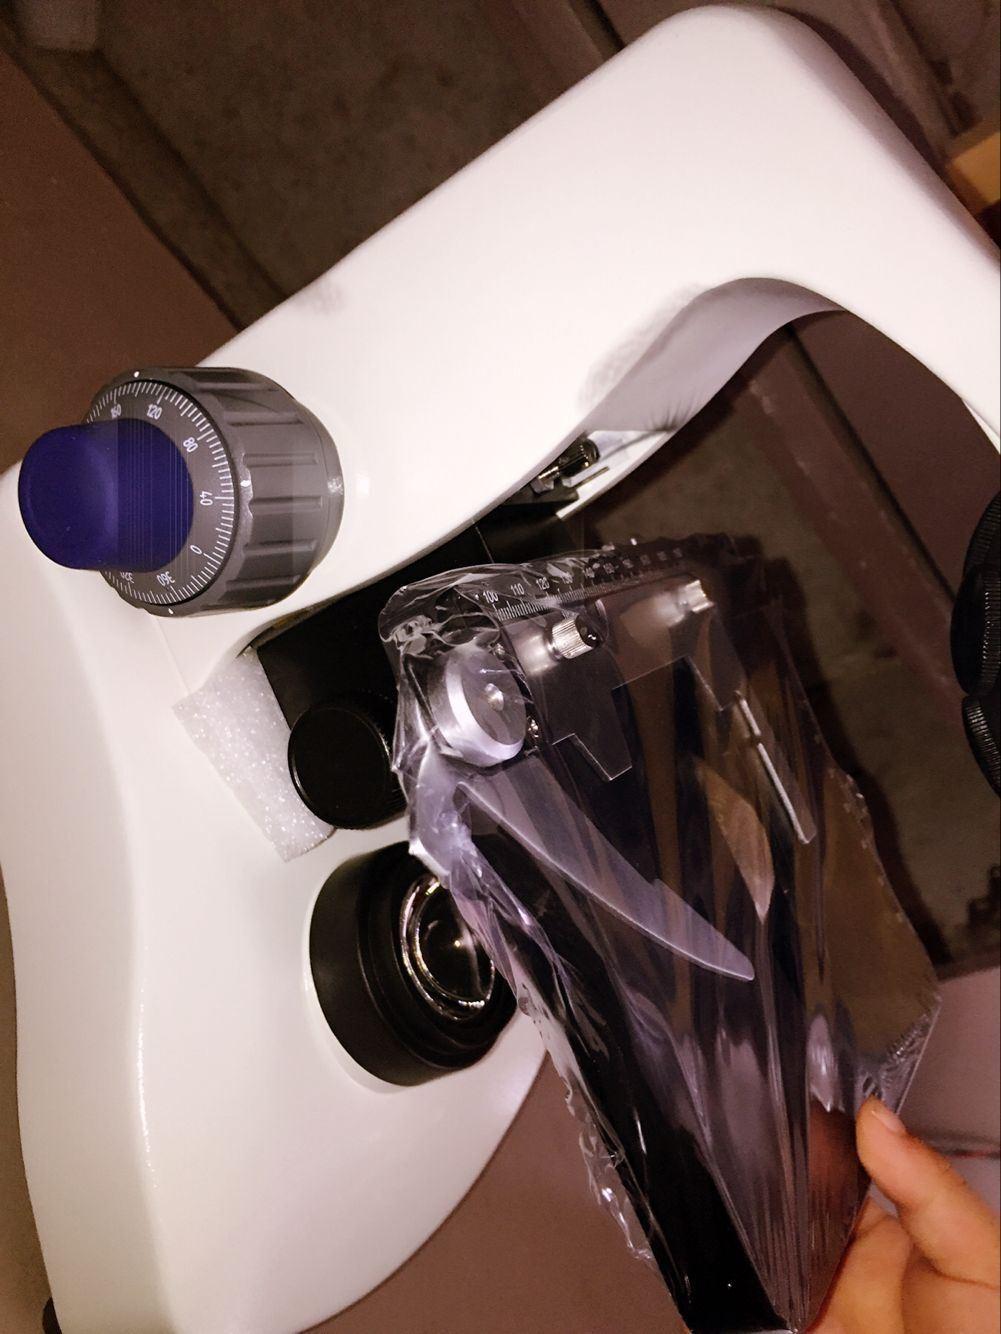 Digital Student Lab Microscope 3.0mega Pixel